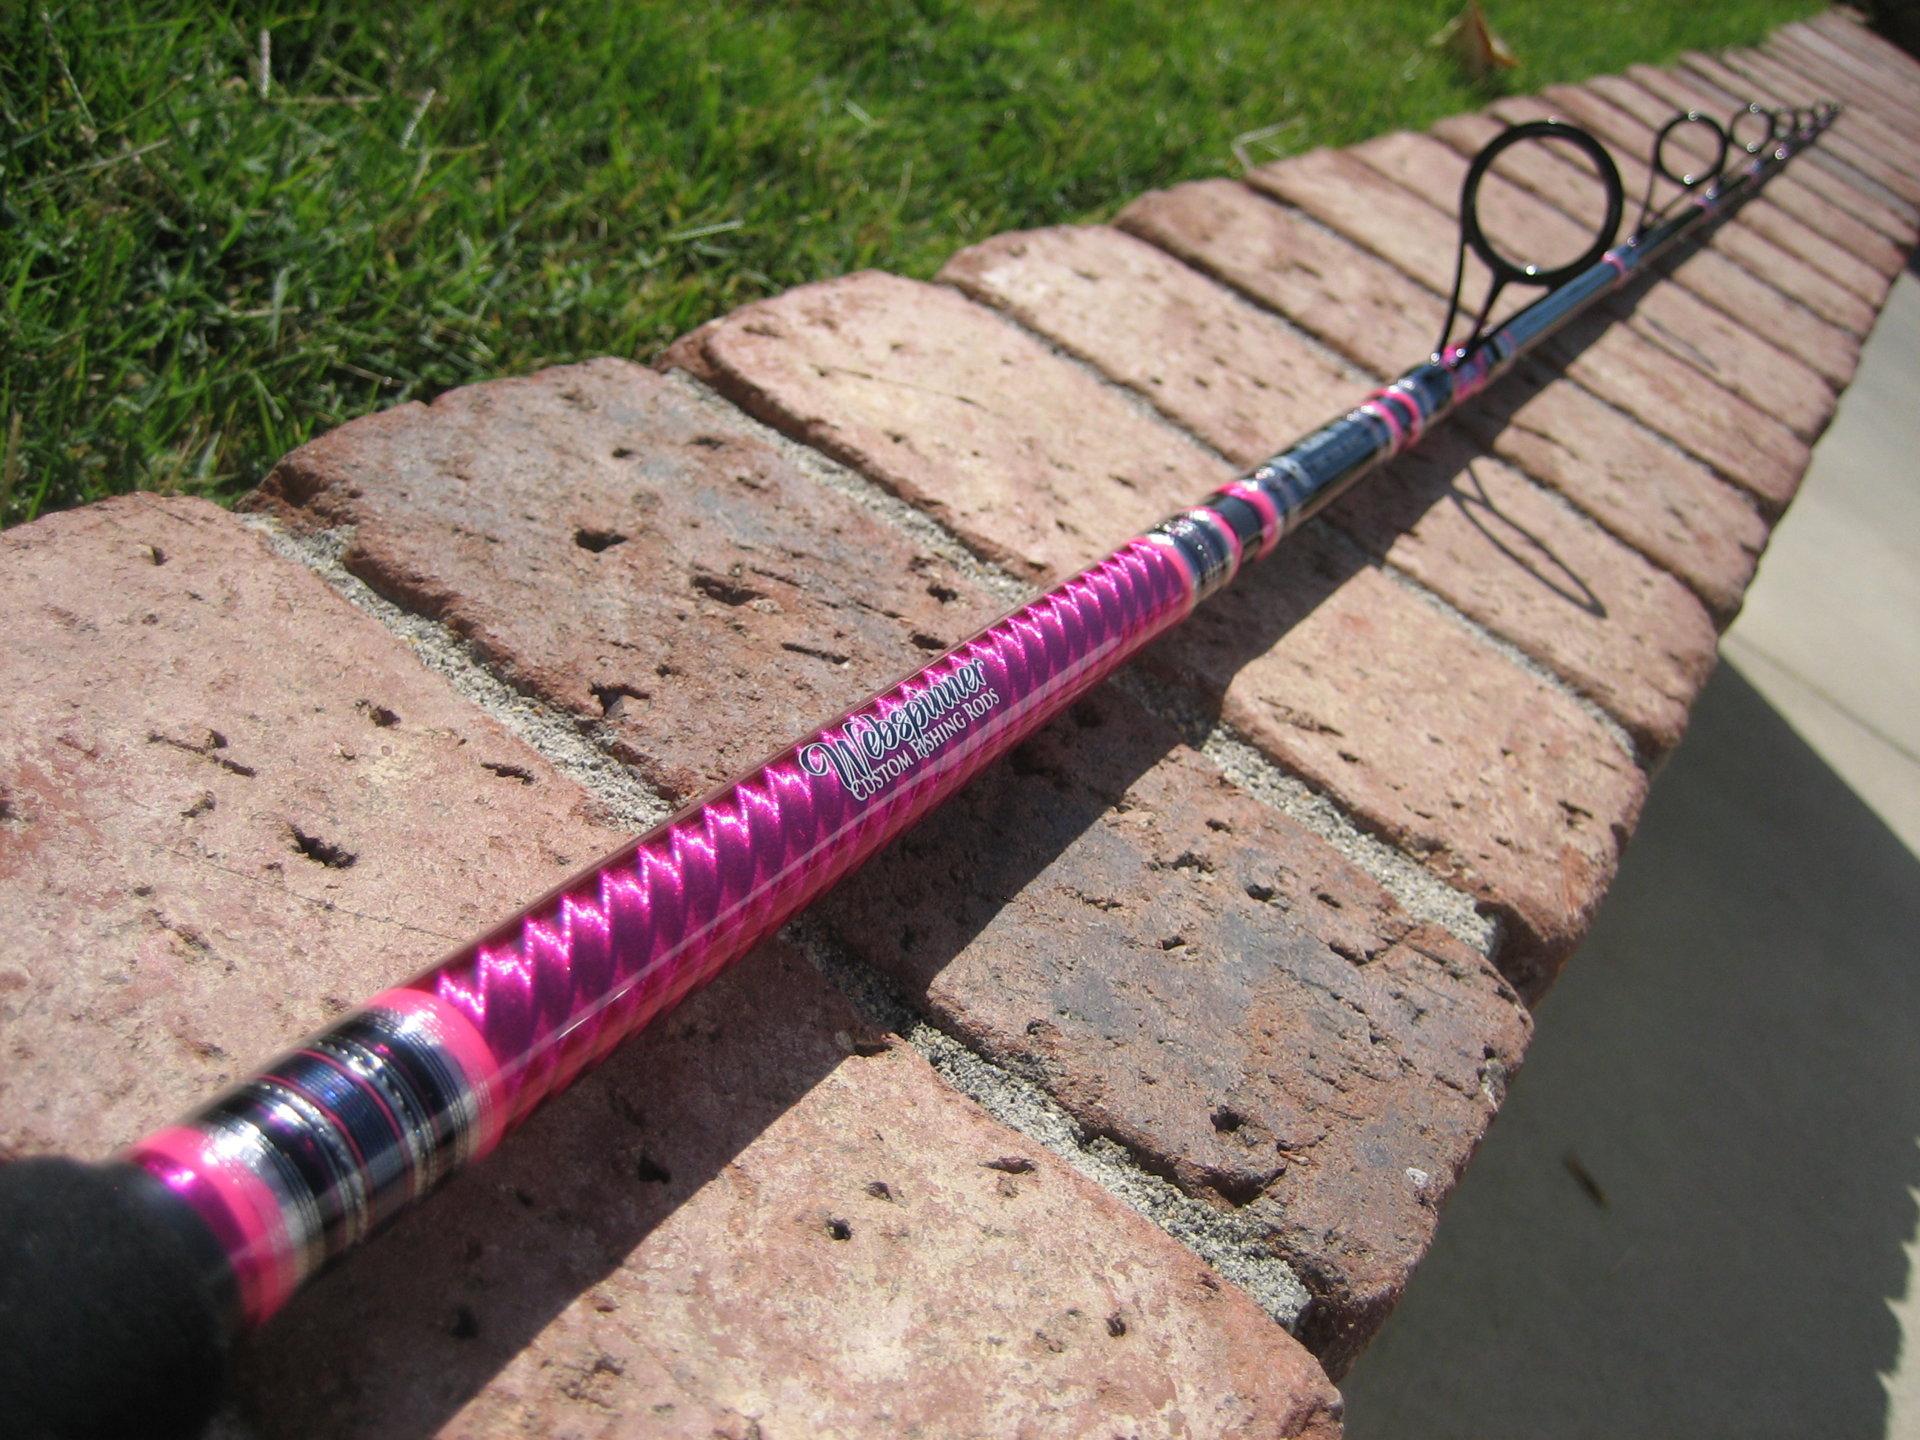 Hot Pink Rainshadow Rclb70xl Bloodydecks